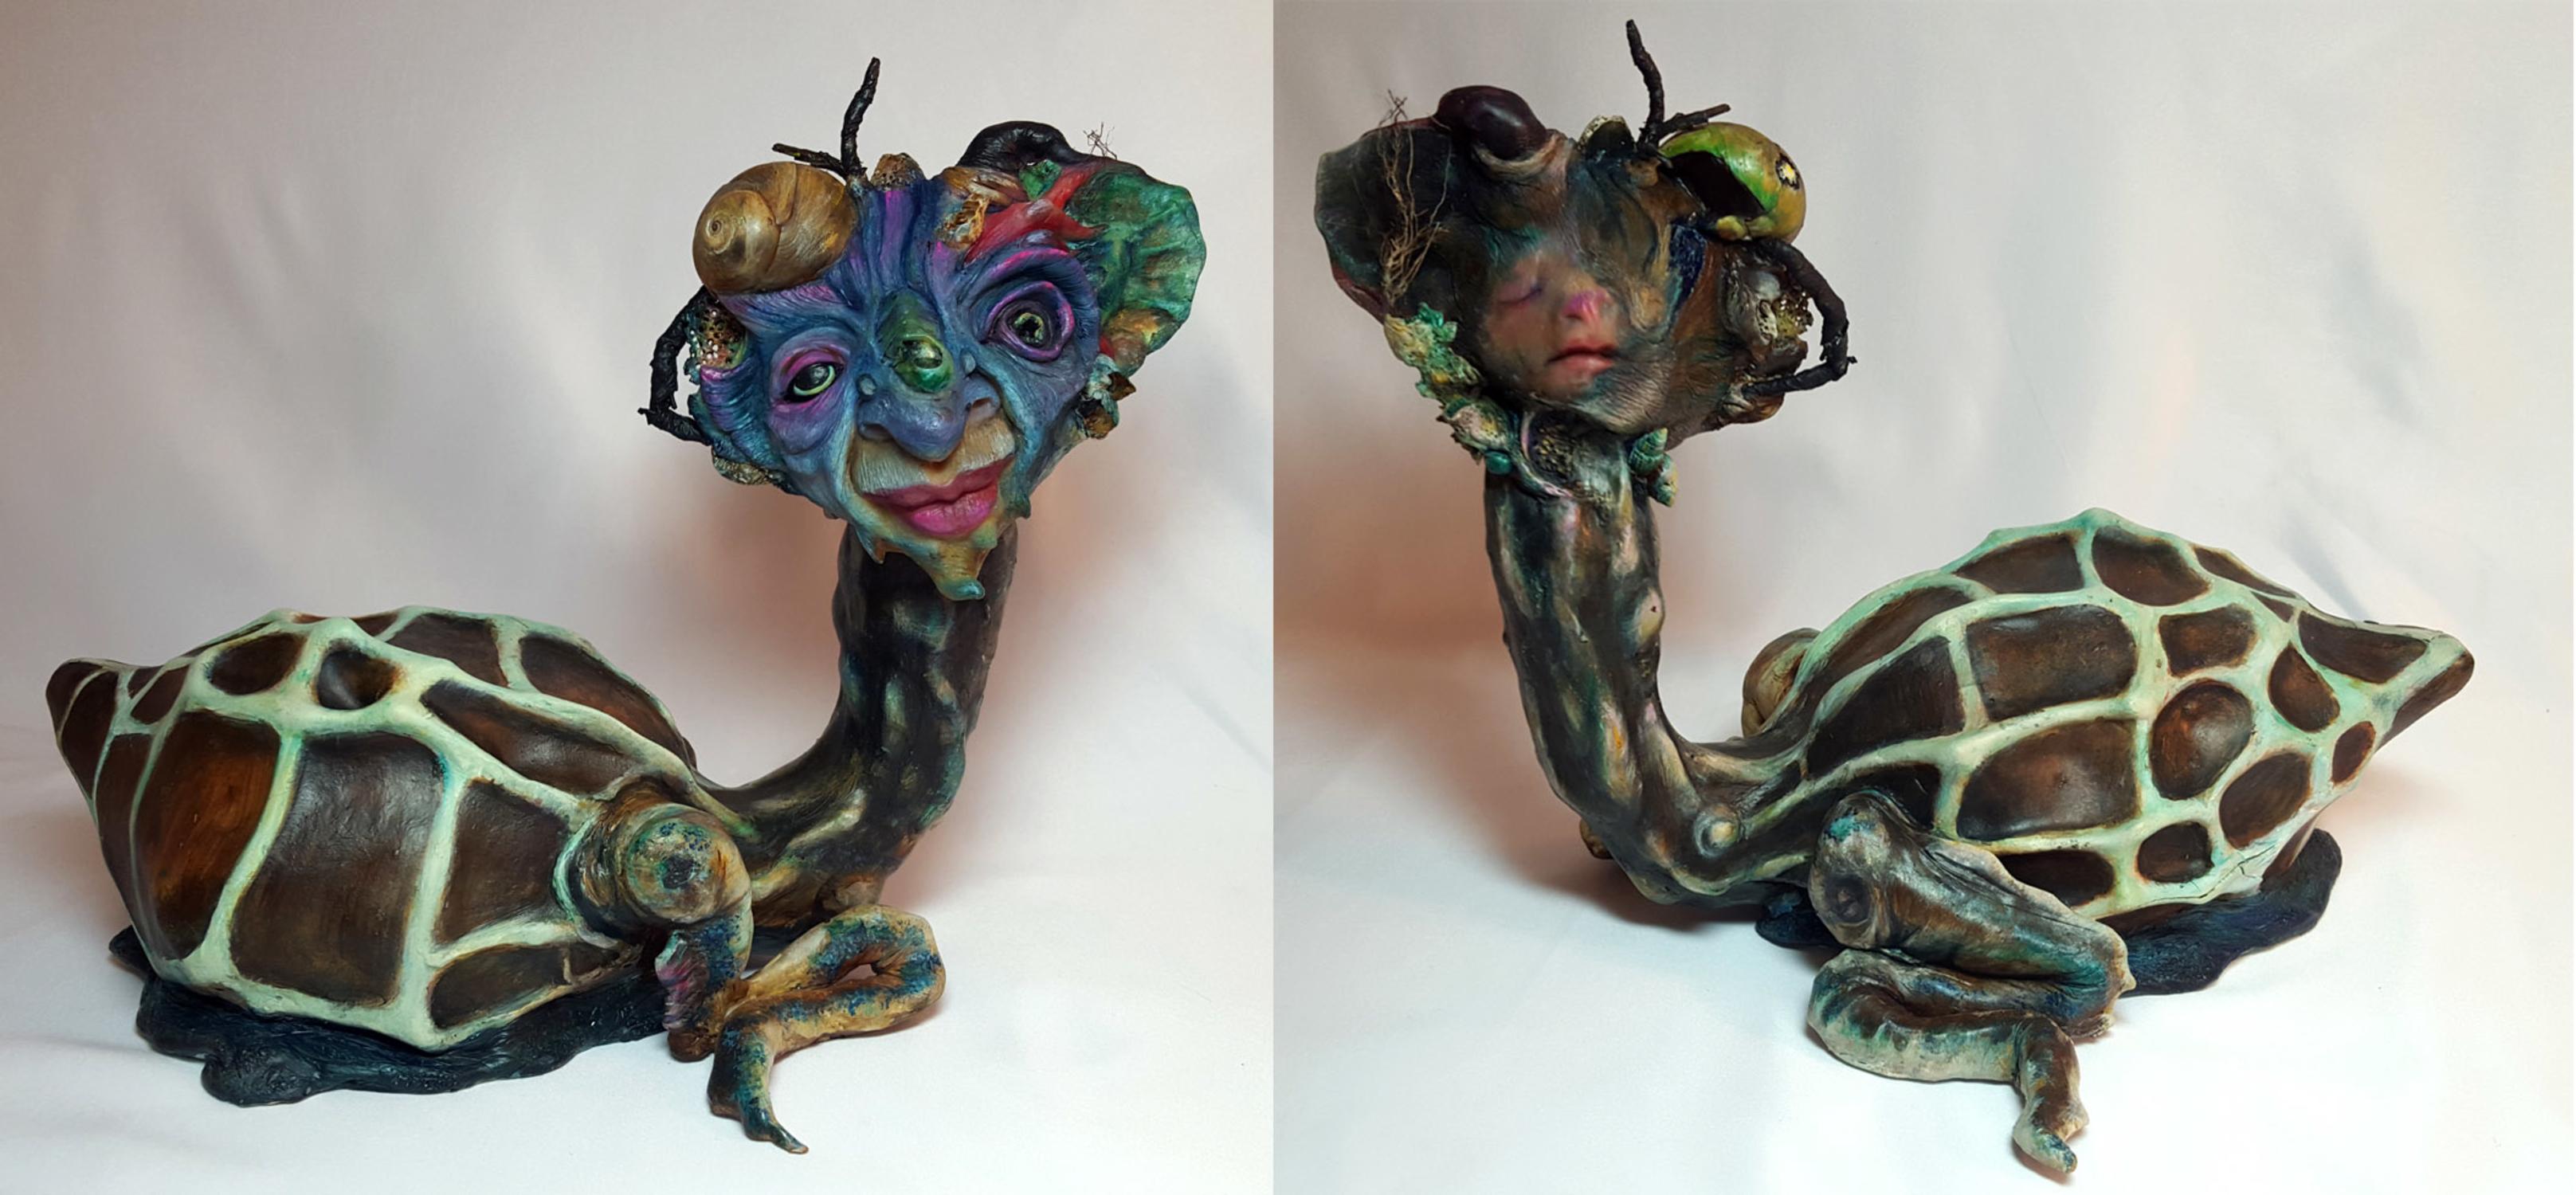 Snell Artwork by Lisa Sprite Hansen